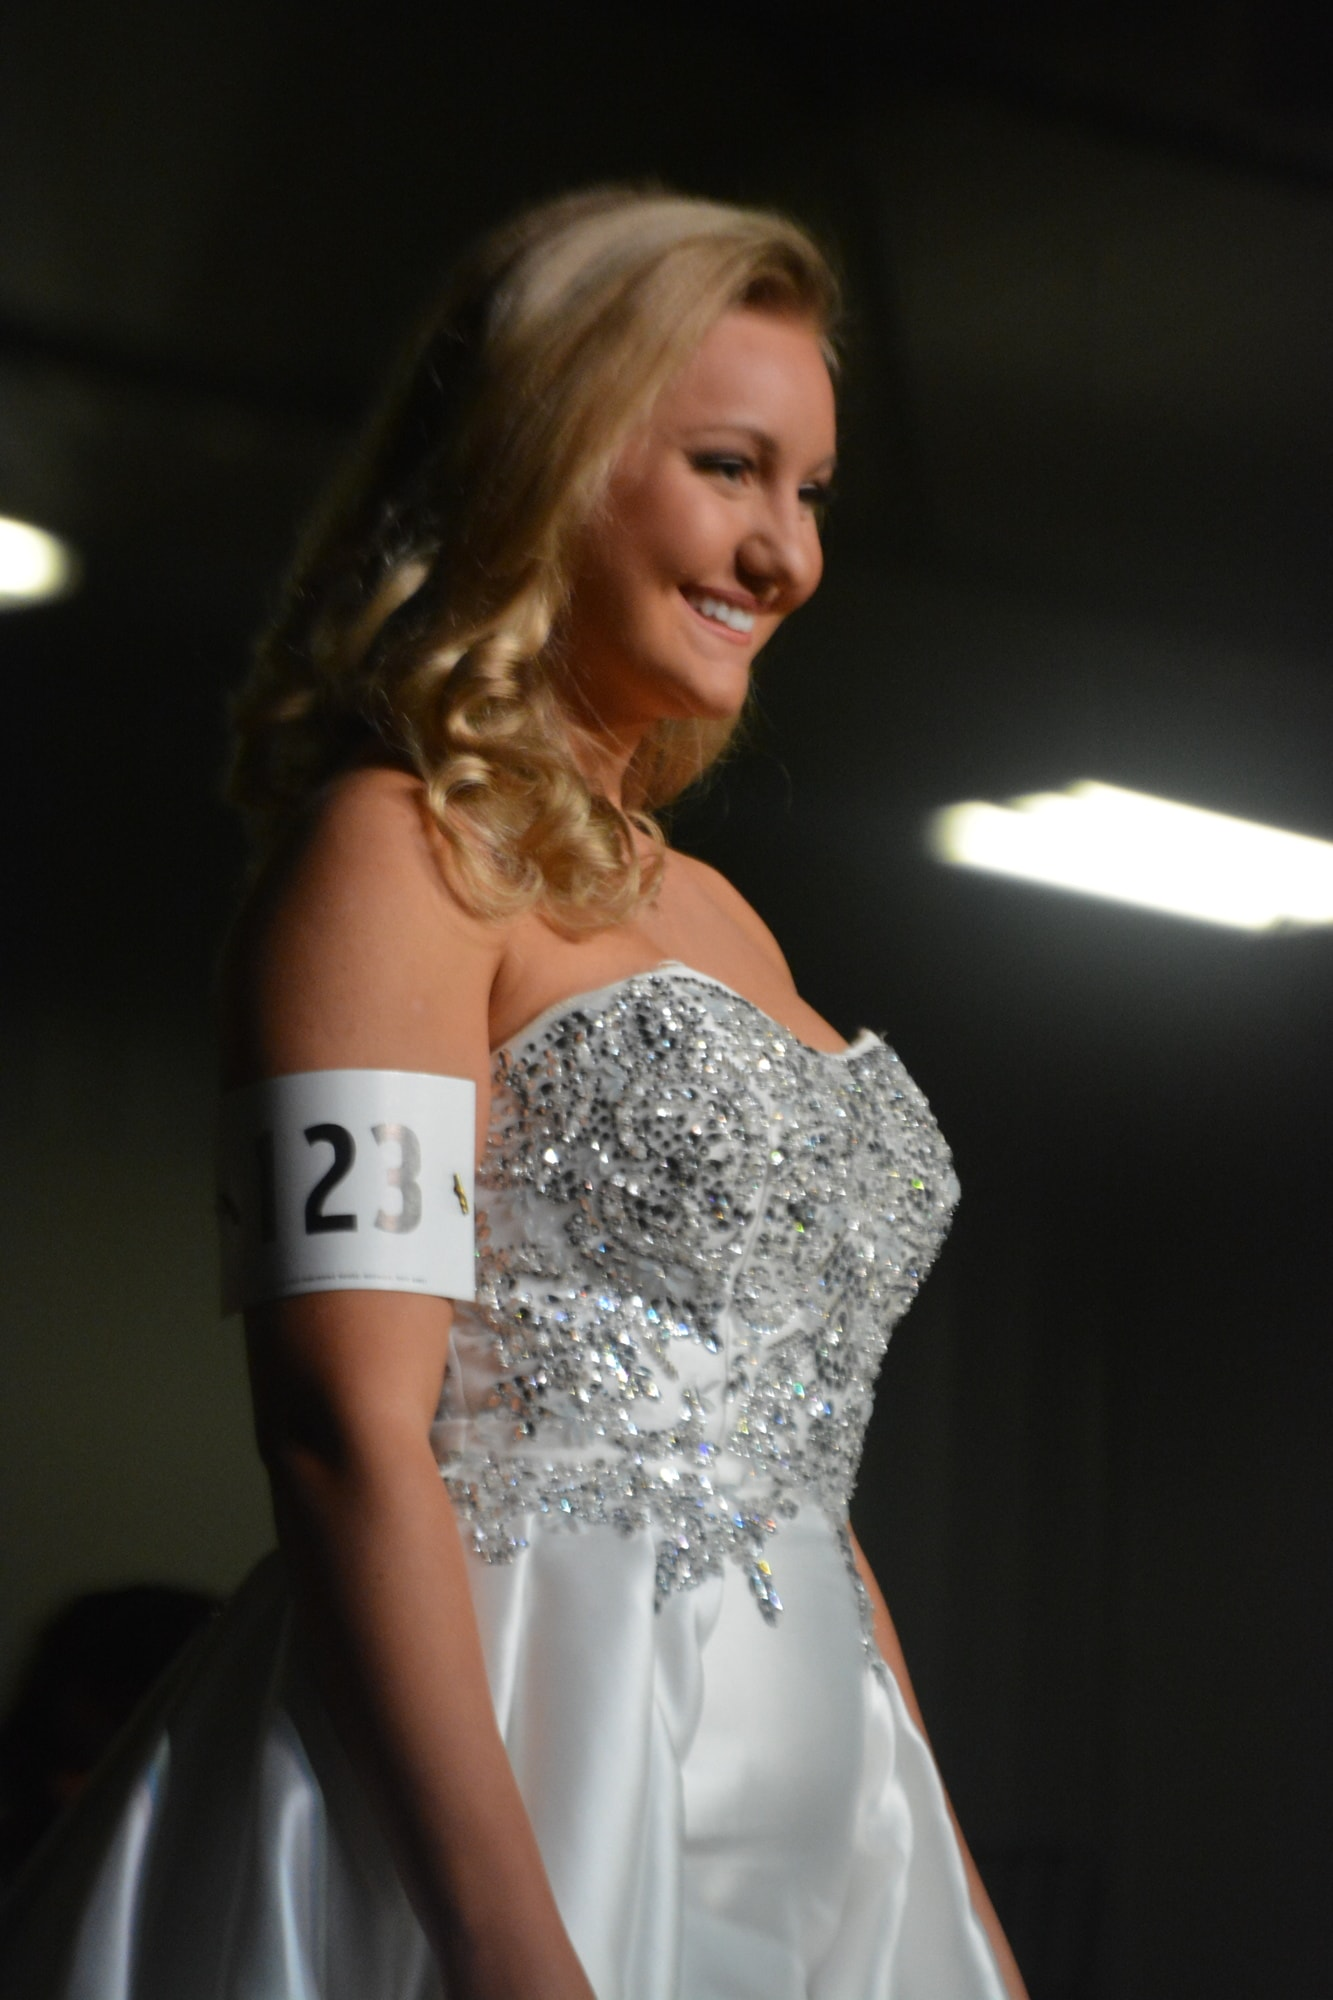 PHOTO GALLERY: 2017 Junior Royalty Pageant — Queen